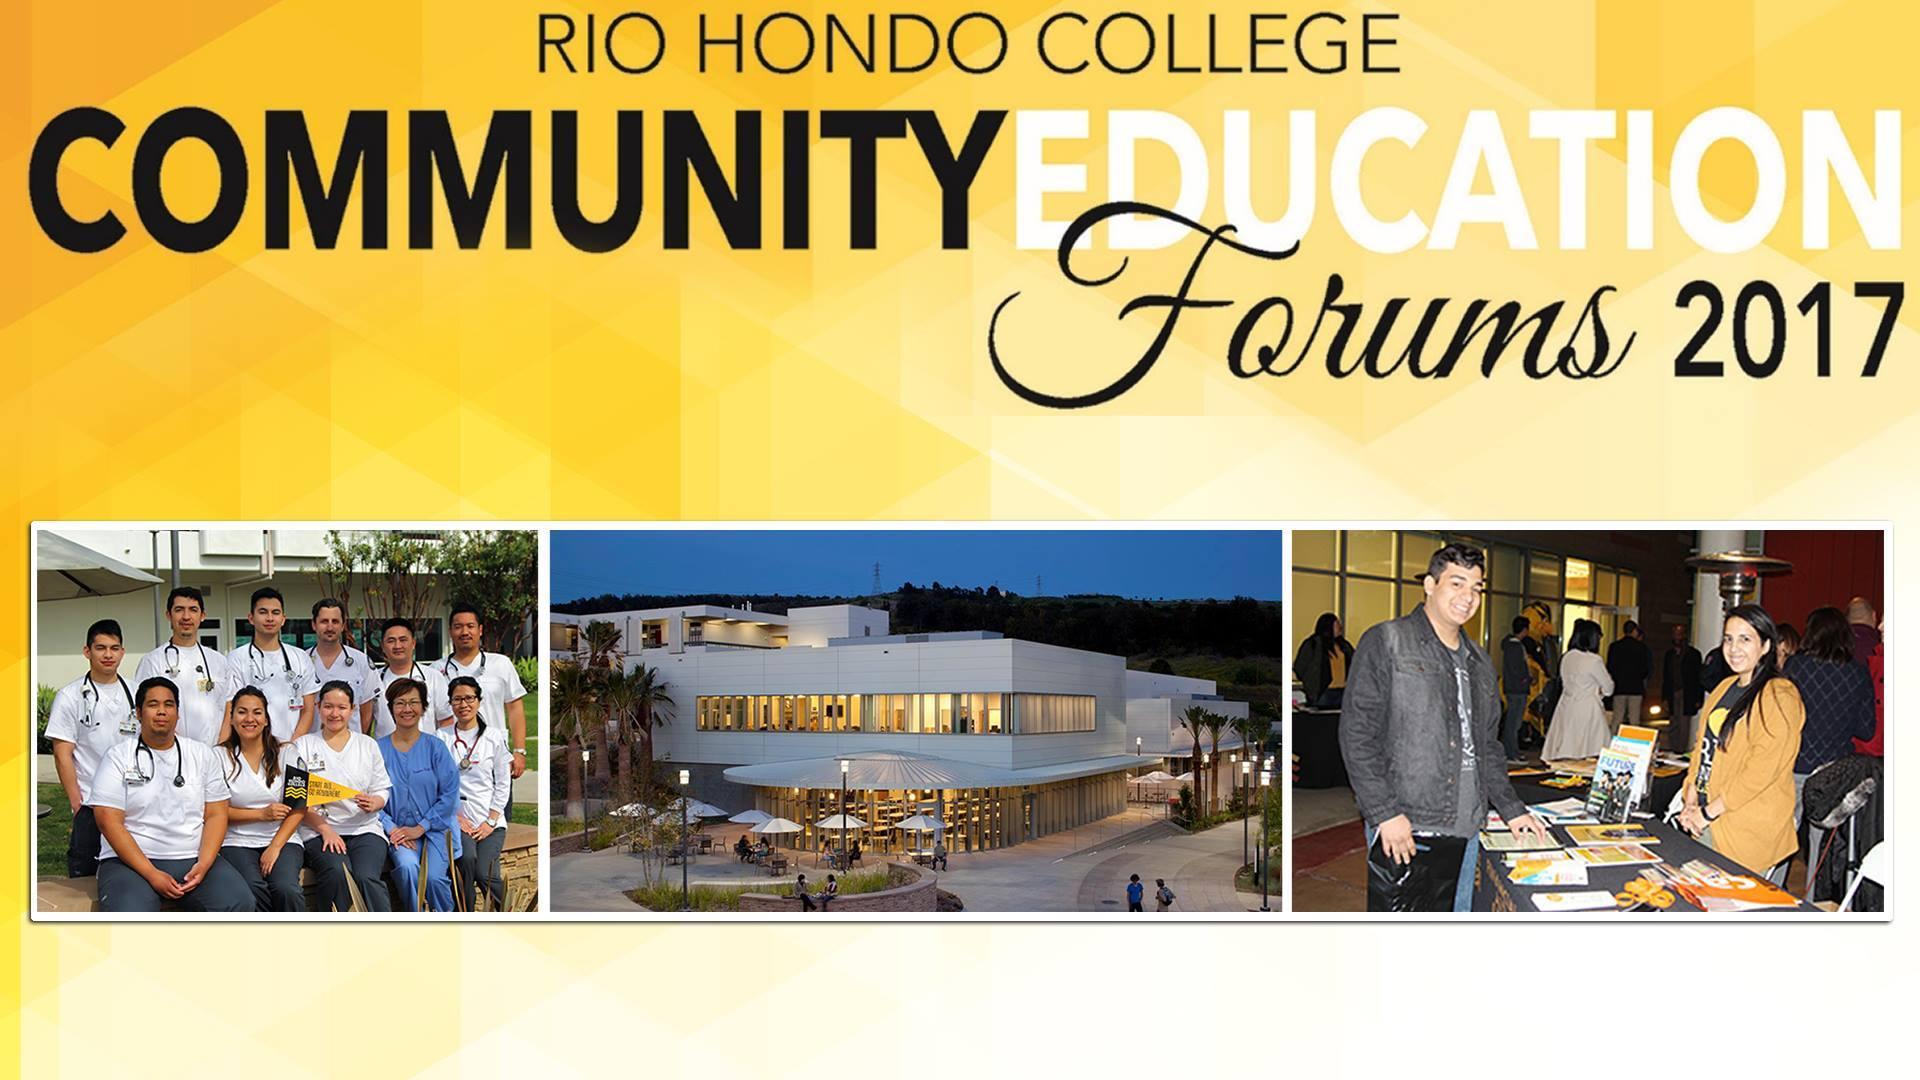 Community Education Forums 2017